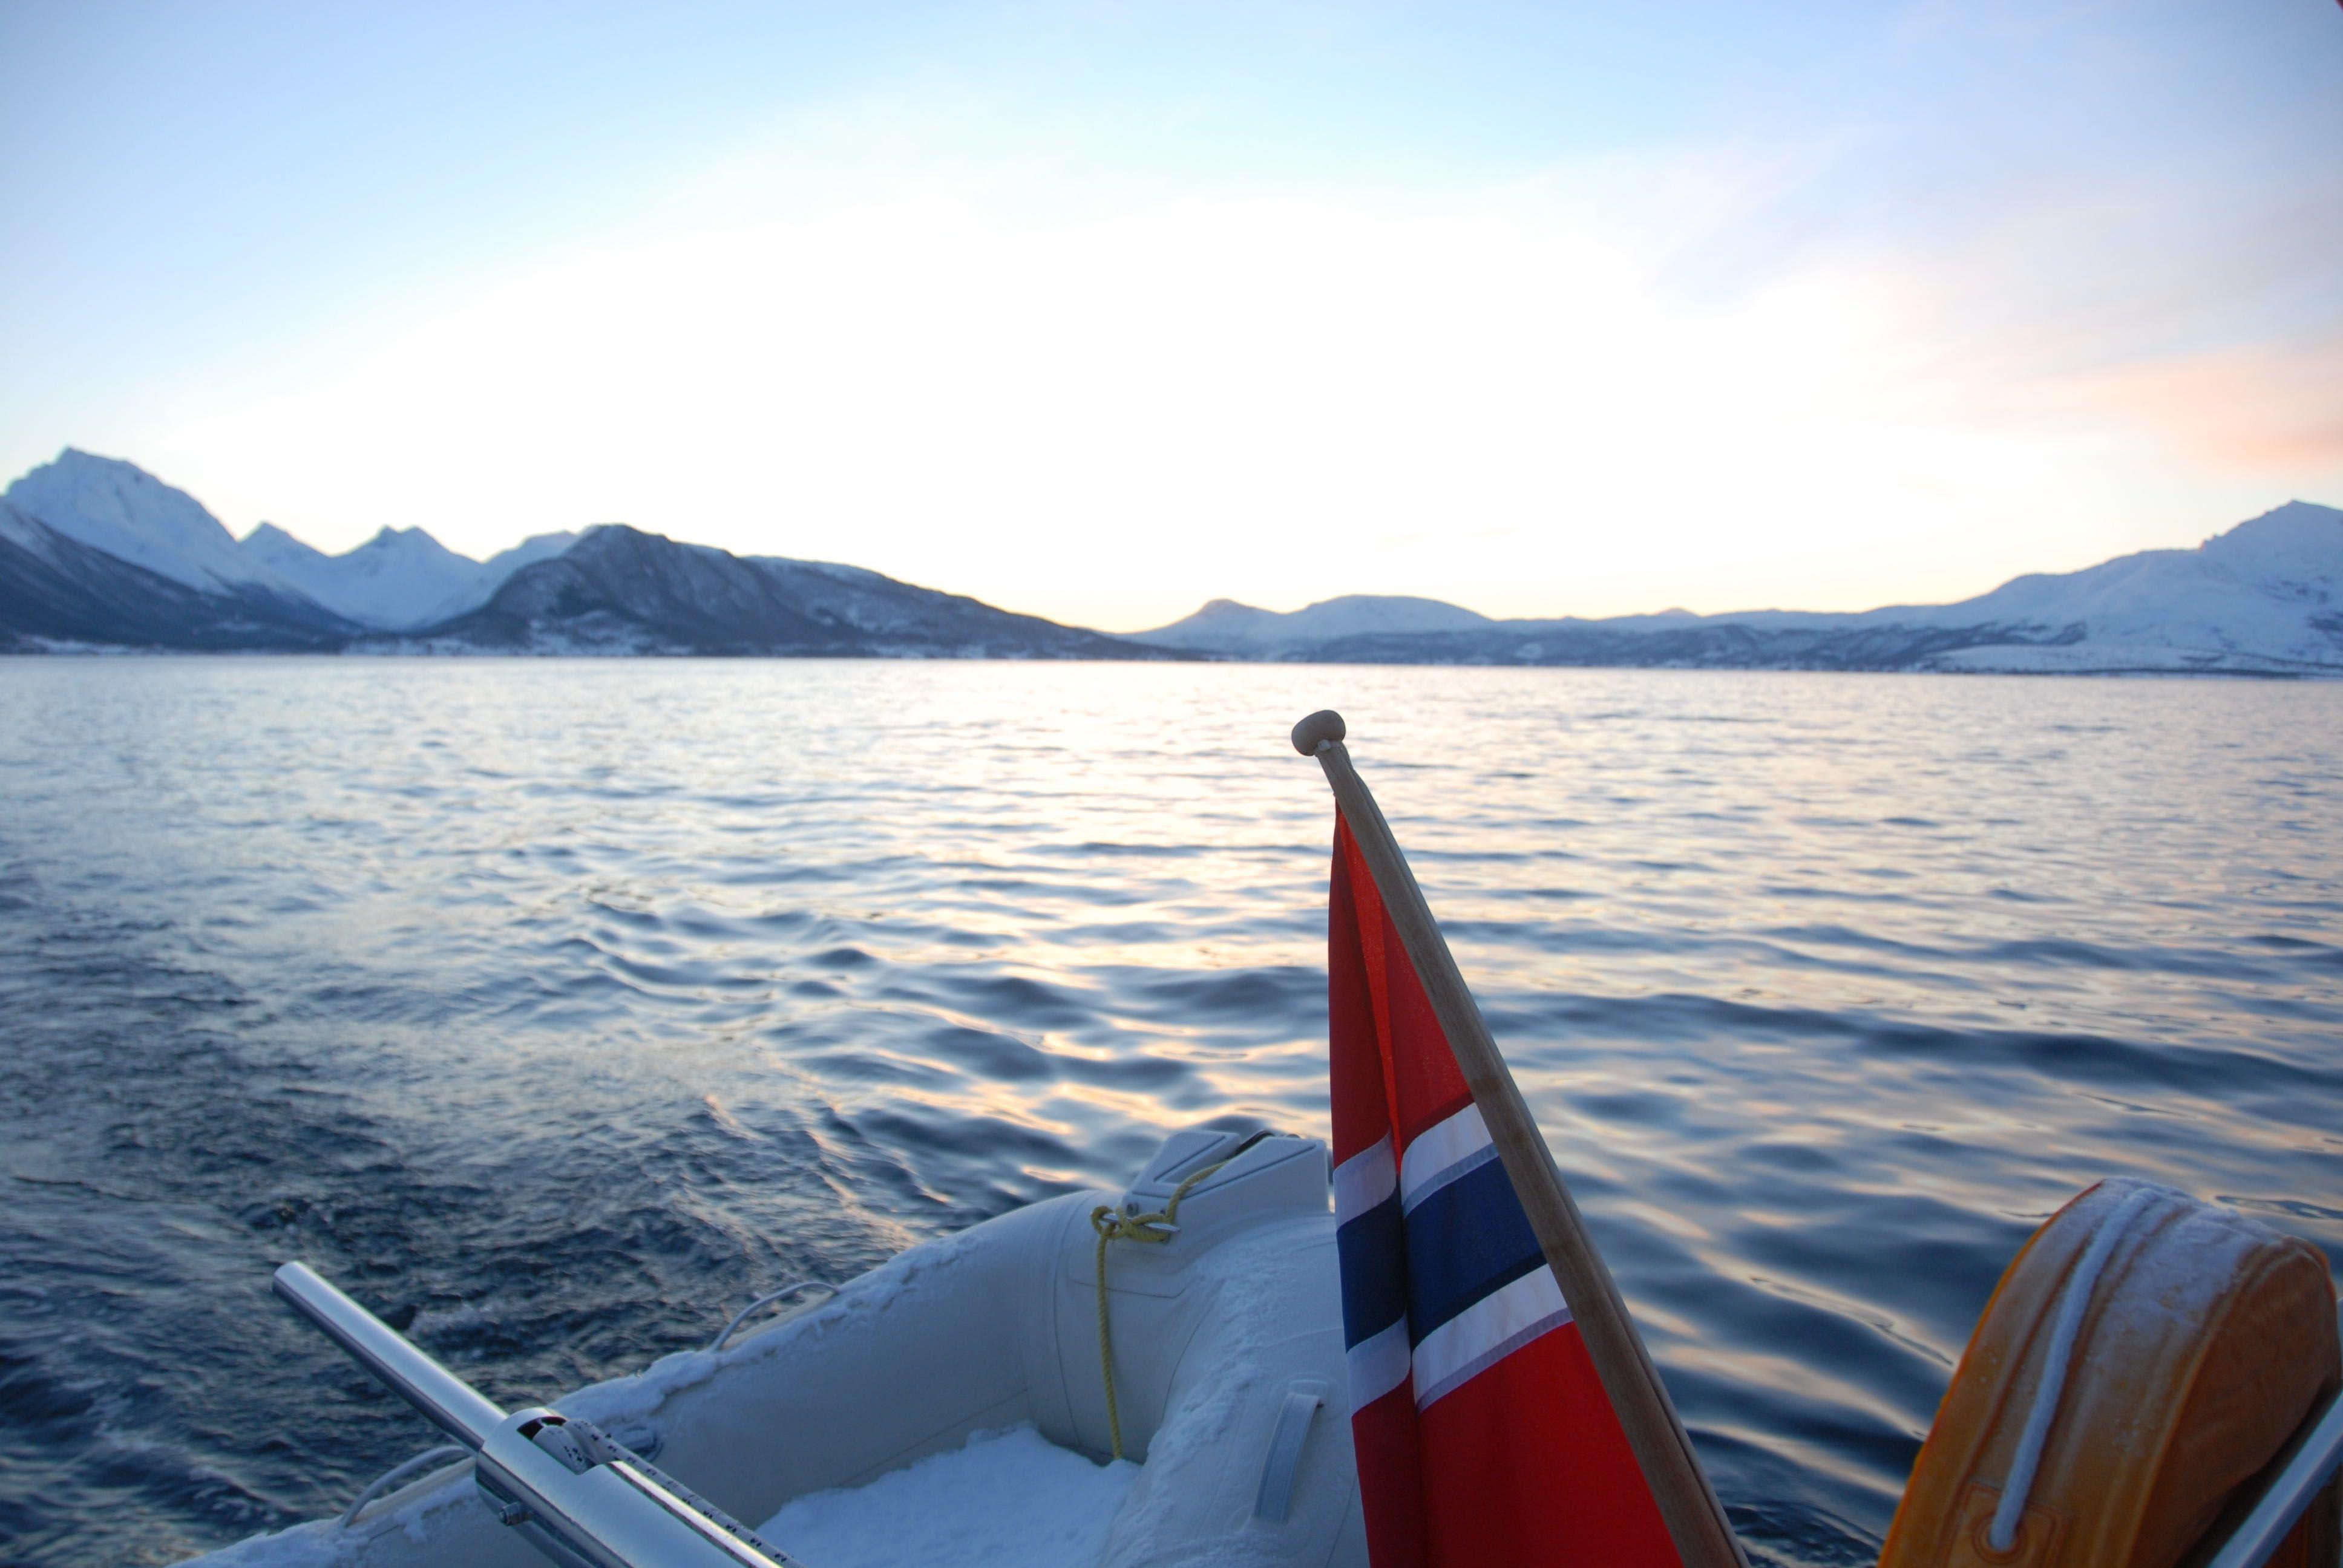 Fjord Cruise – Seiltur i Tromsø skjærgård - Arctic Cruise in Norway